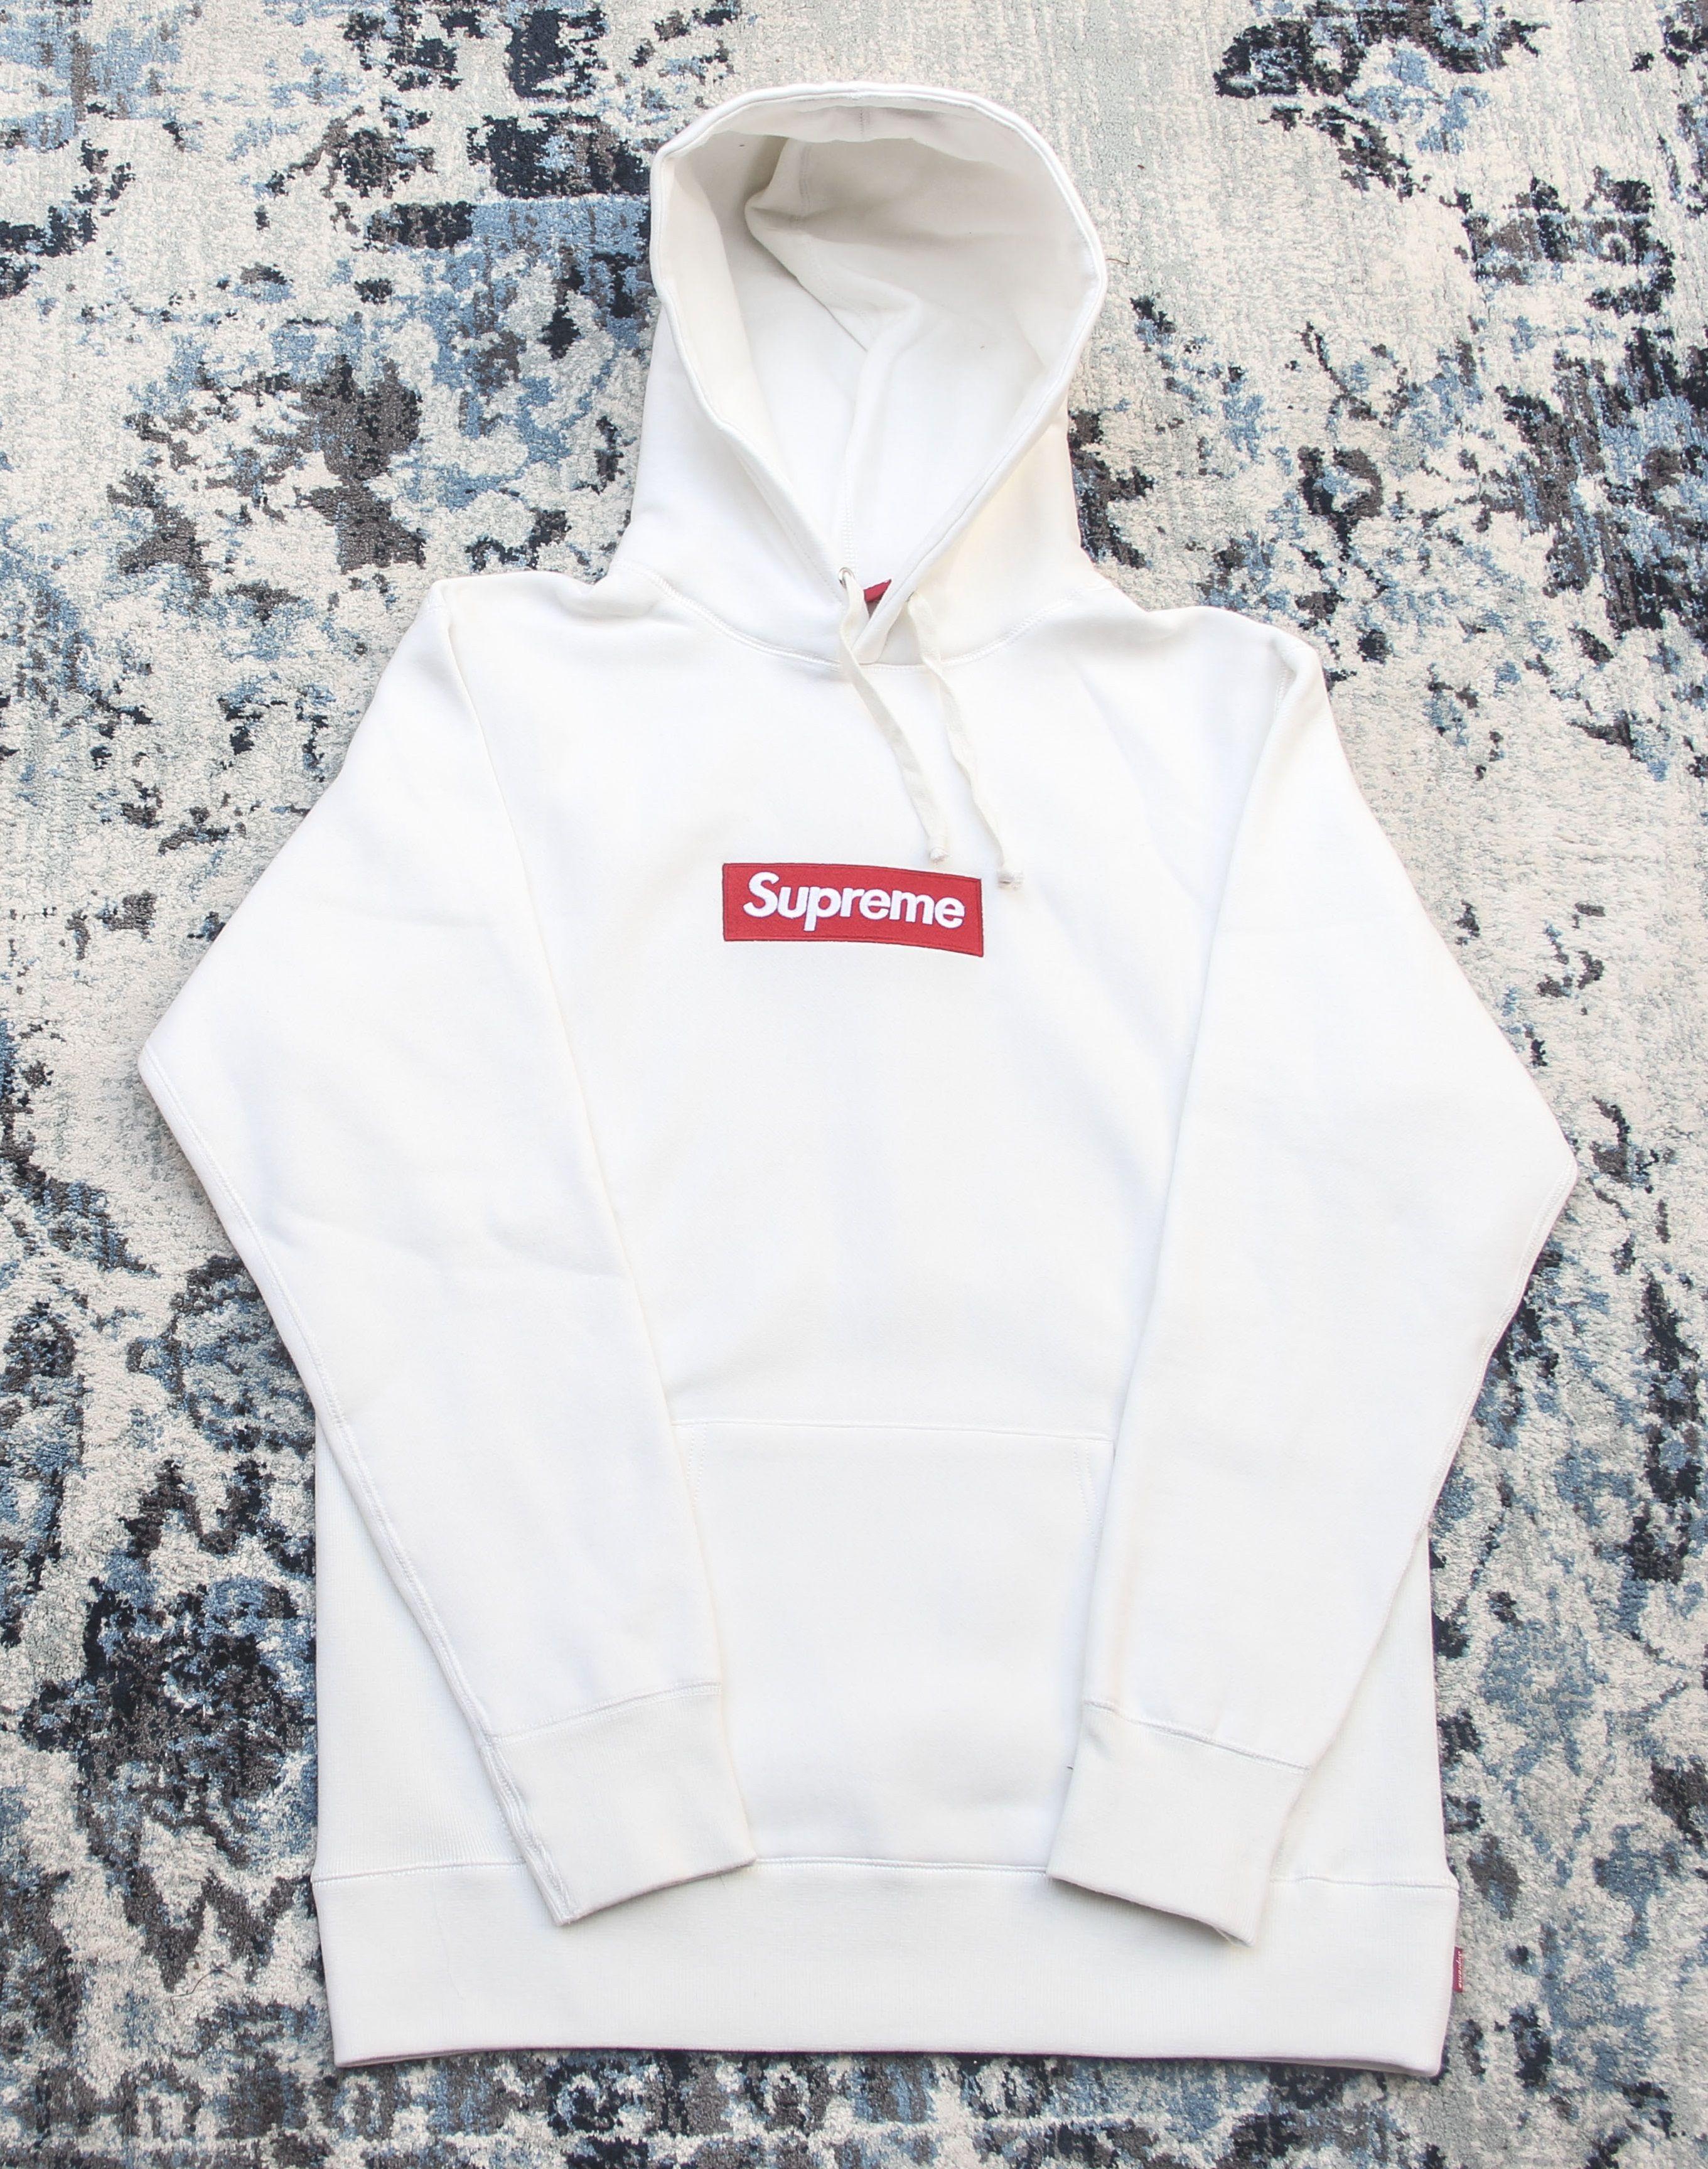 supreme jacket price